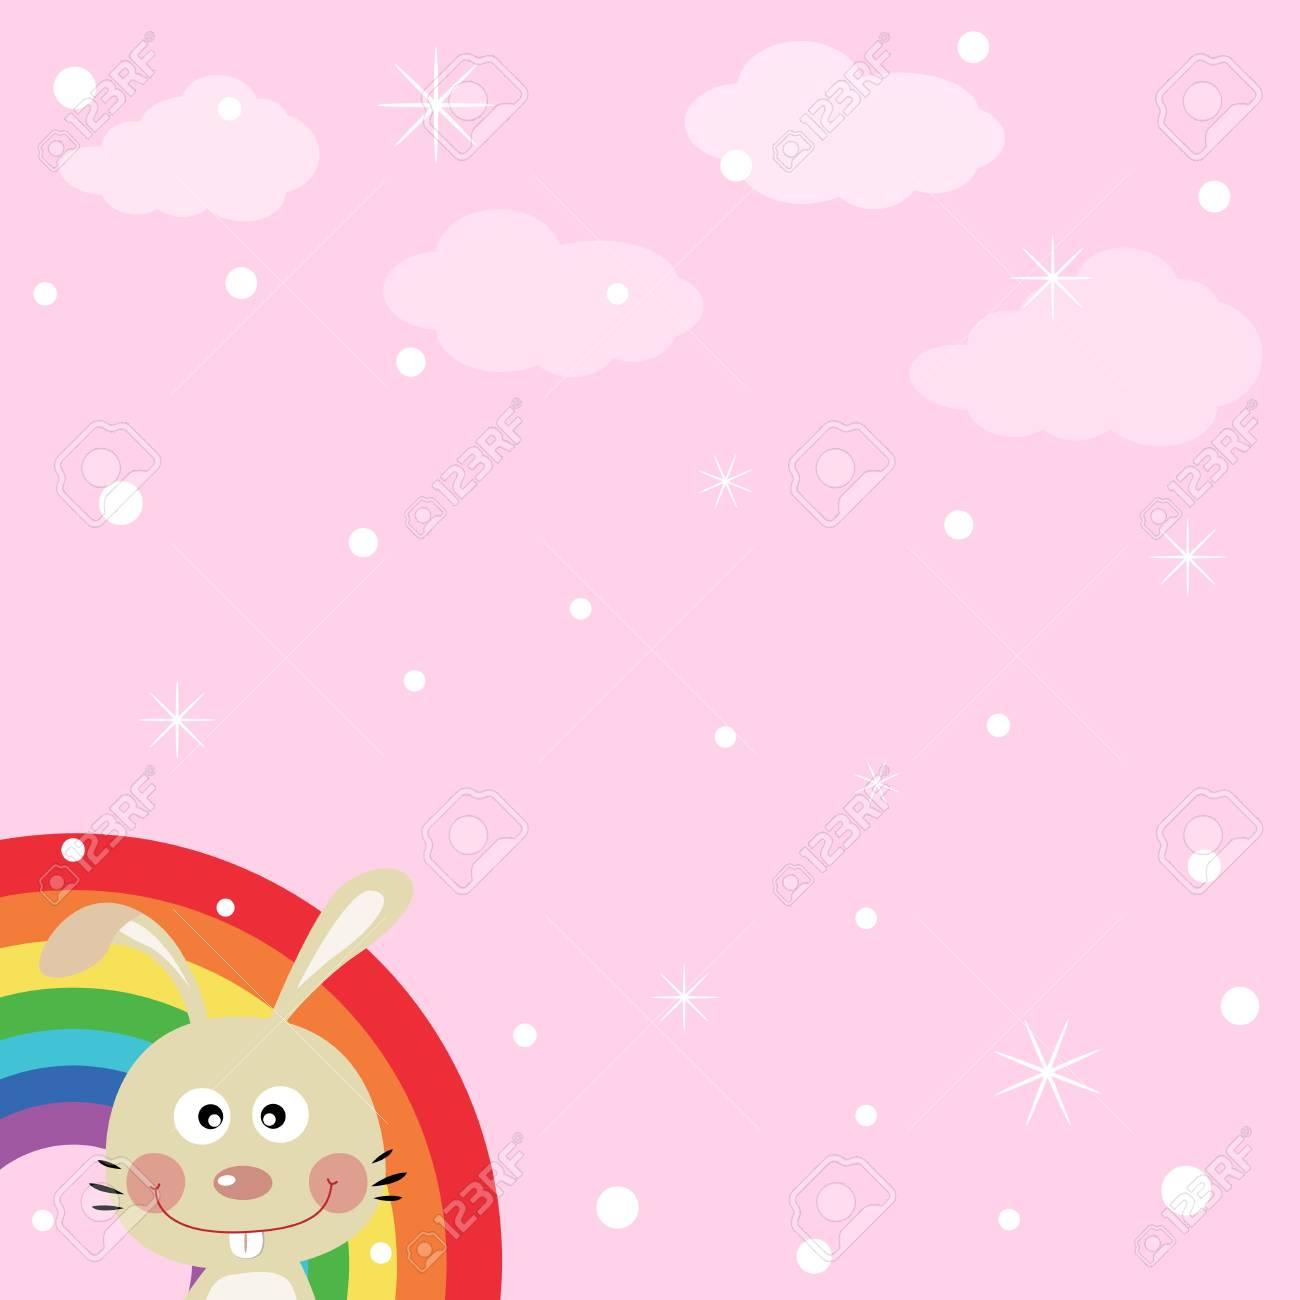 Rabbit in the sky with rainbow Stock Vector - 16714948